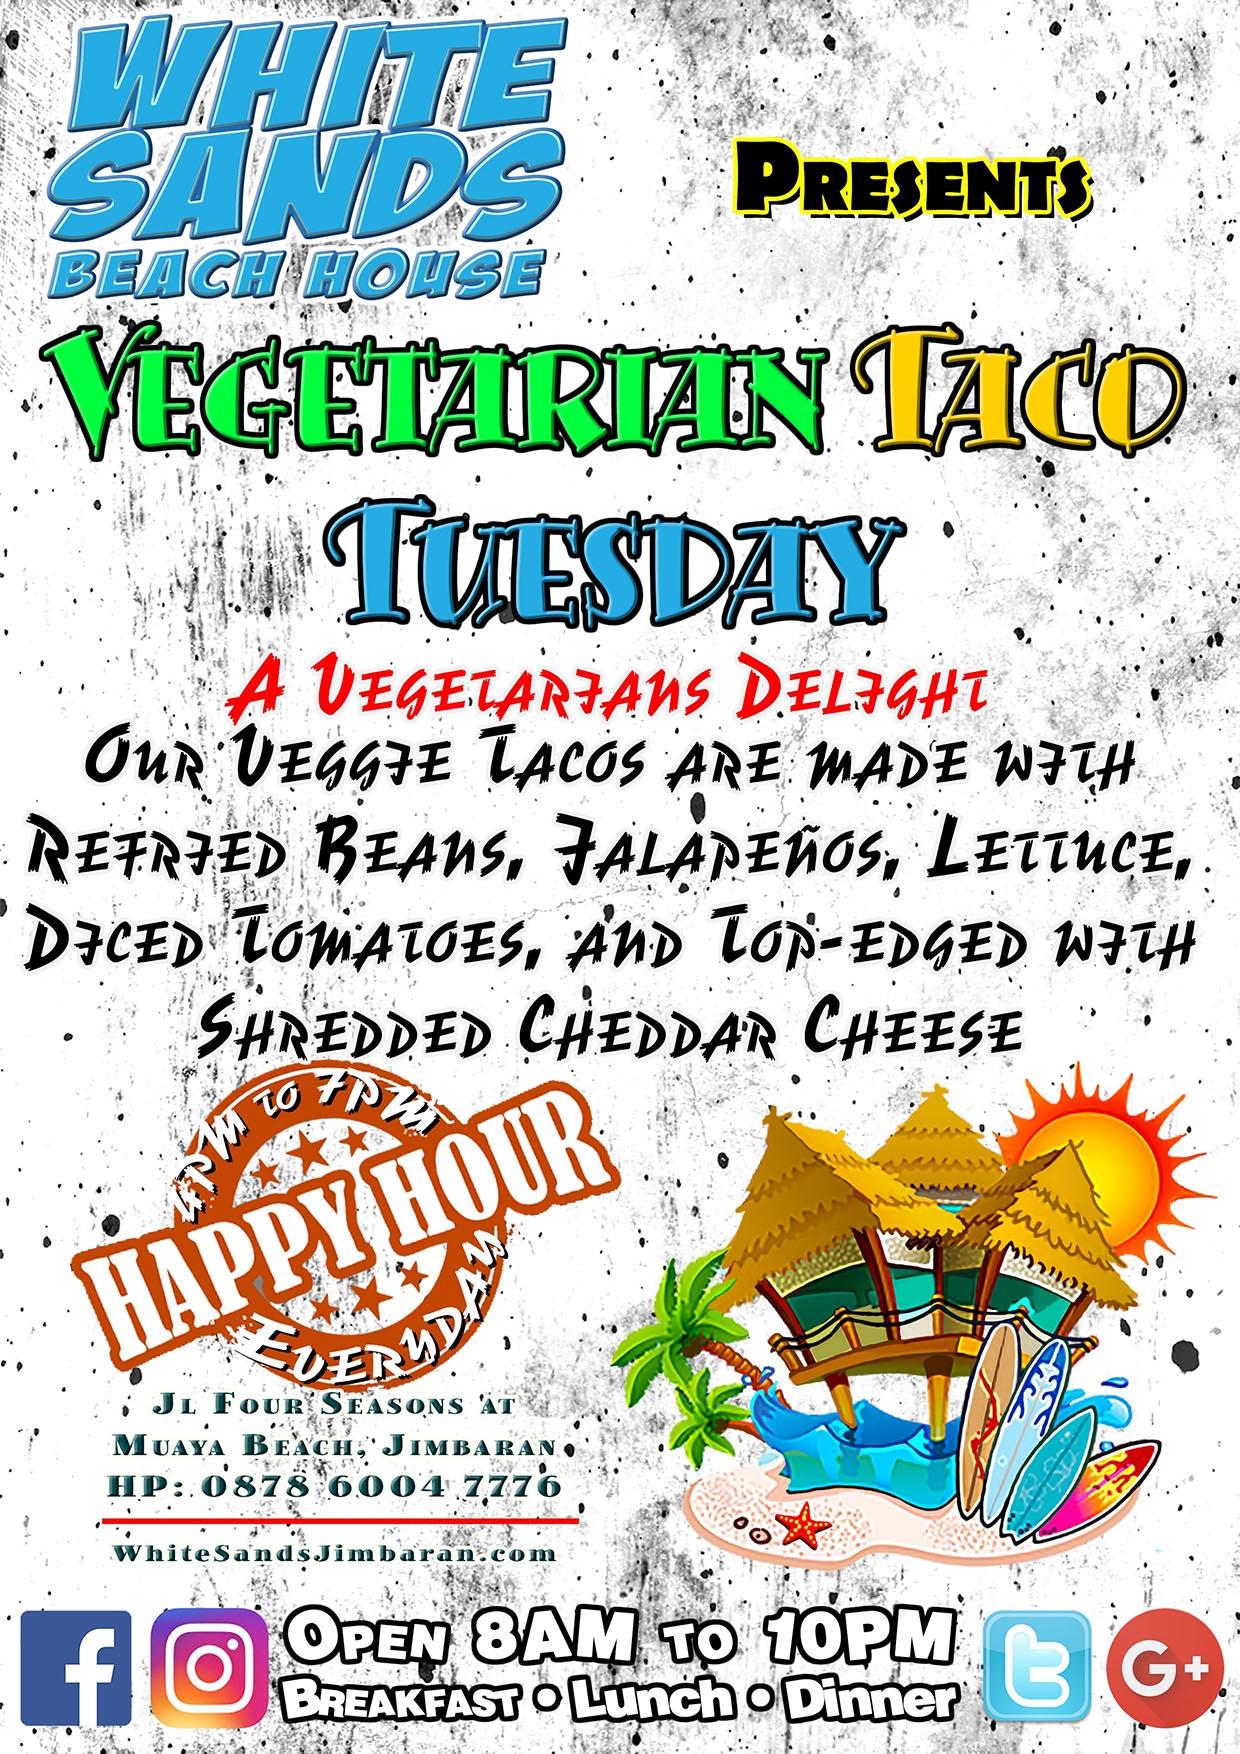 White Sands Beach House Vegetarian Taco Tuesday